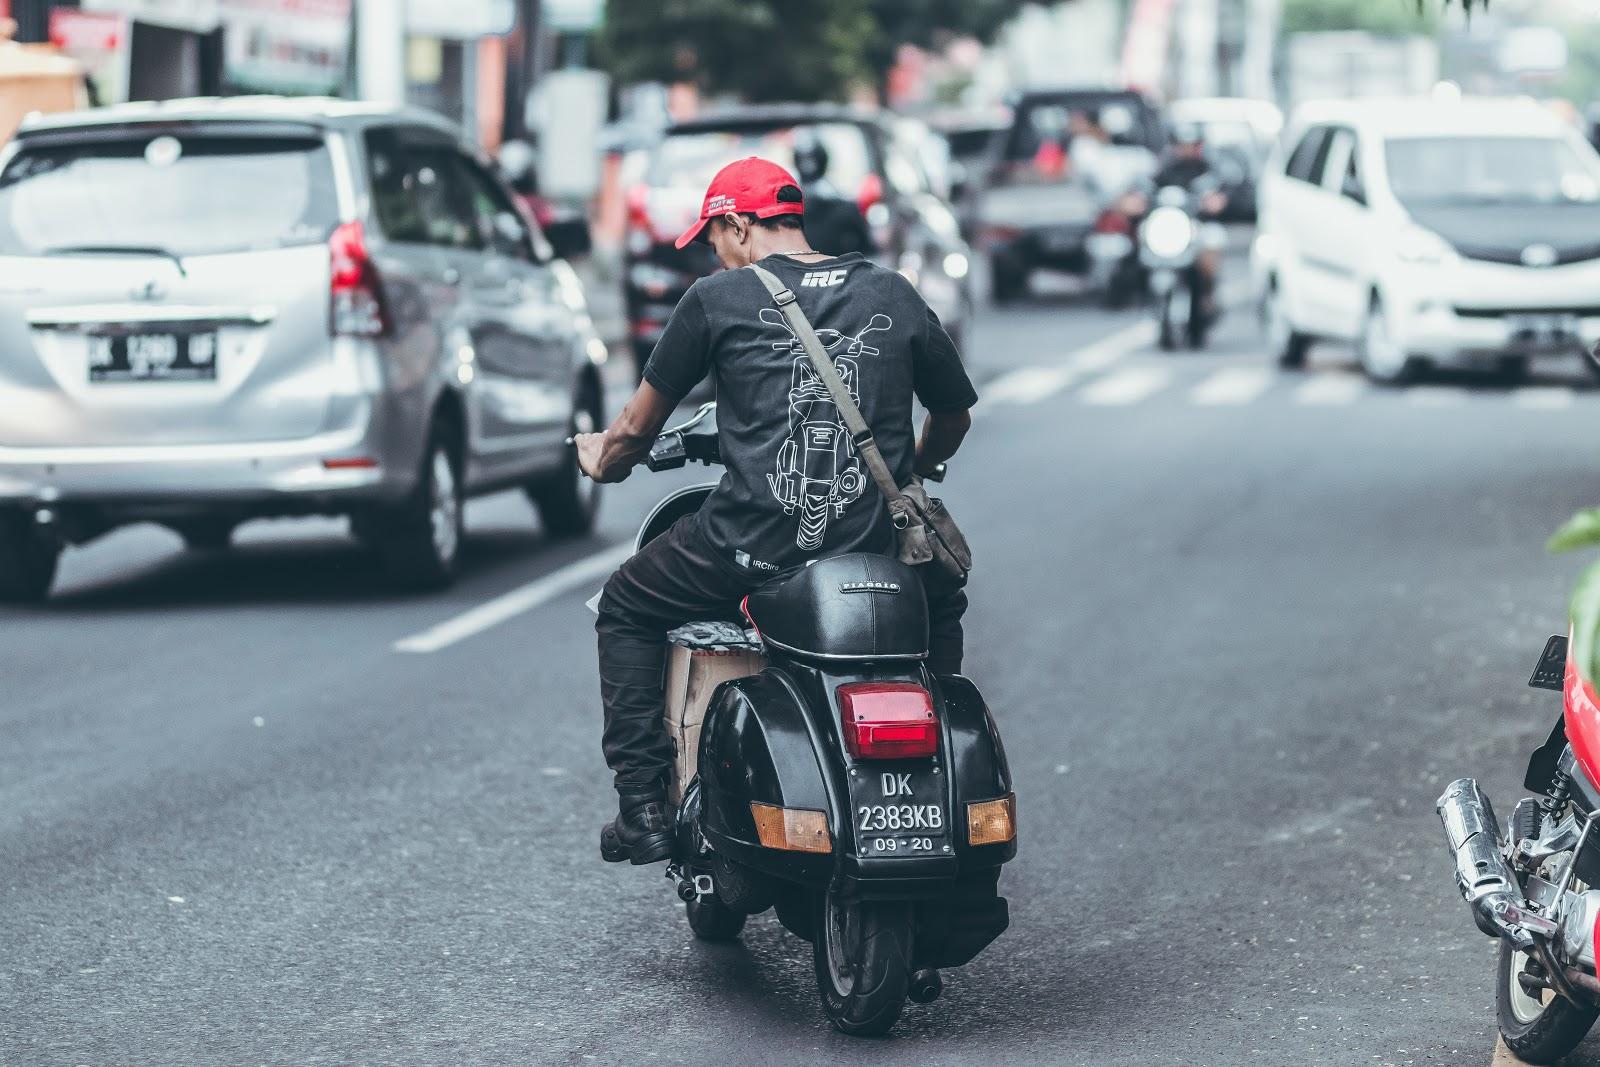 asphalt biker blur 1144169